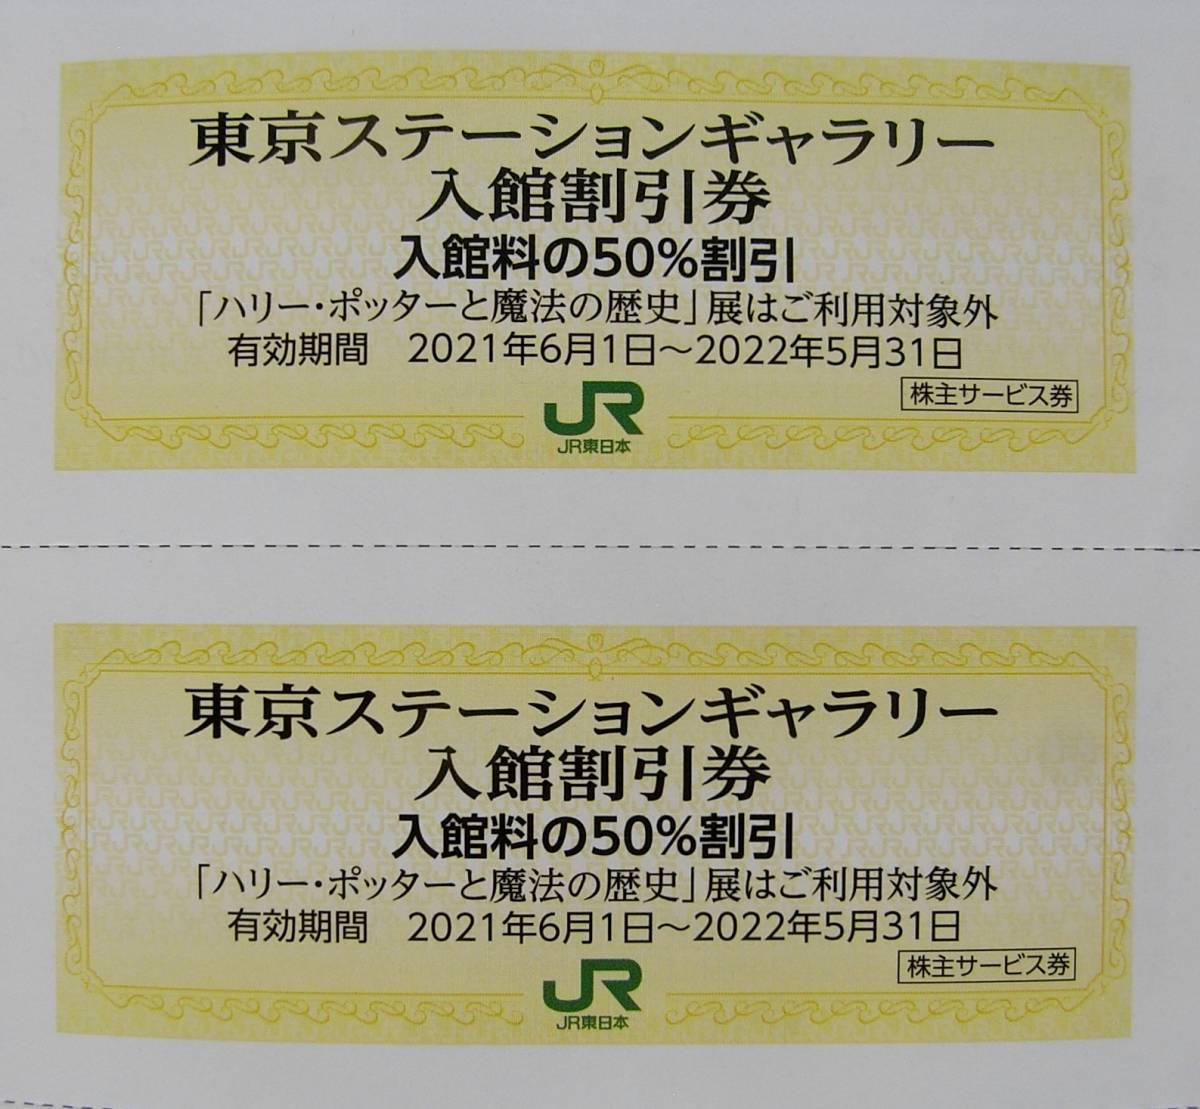 ★JR東日本 東京ステーションギャラリー入館割引券(50%割引)×2枚 期限 2022年5月31日 まで_画像1